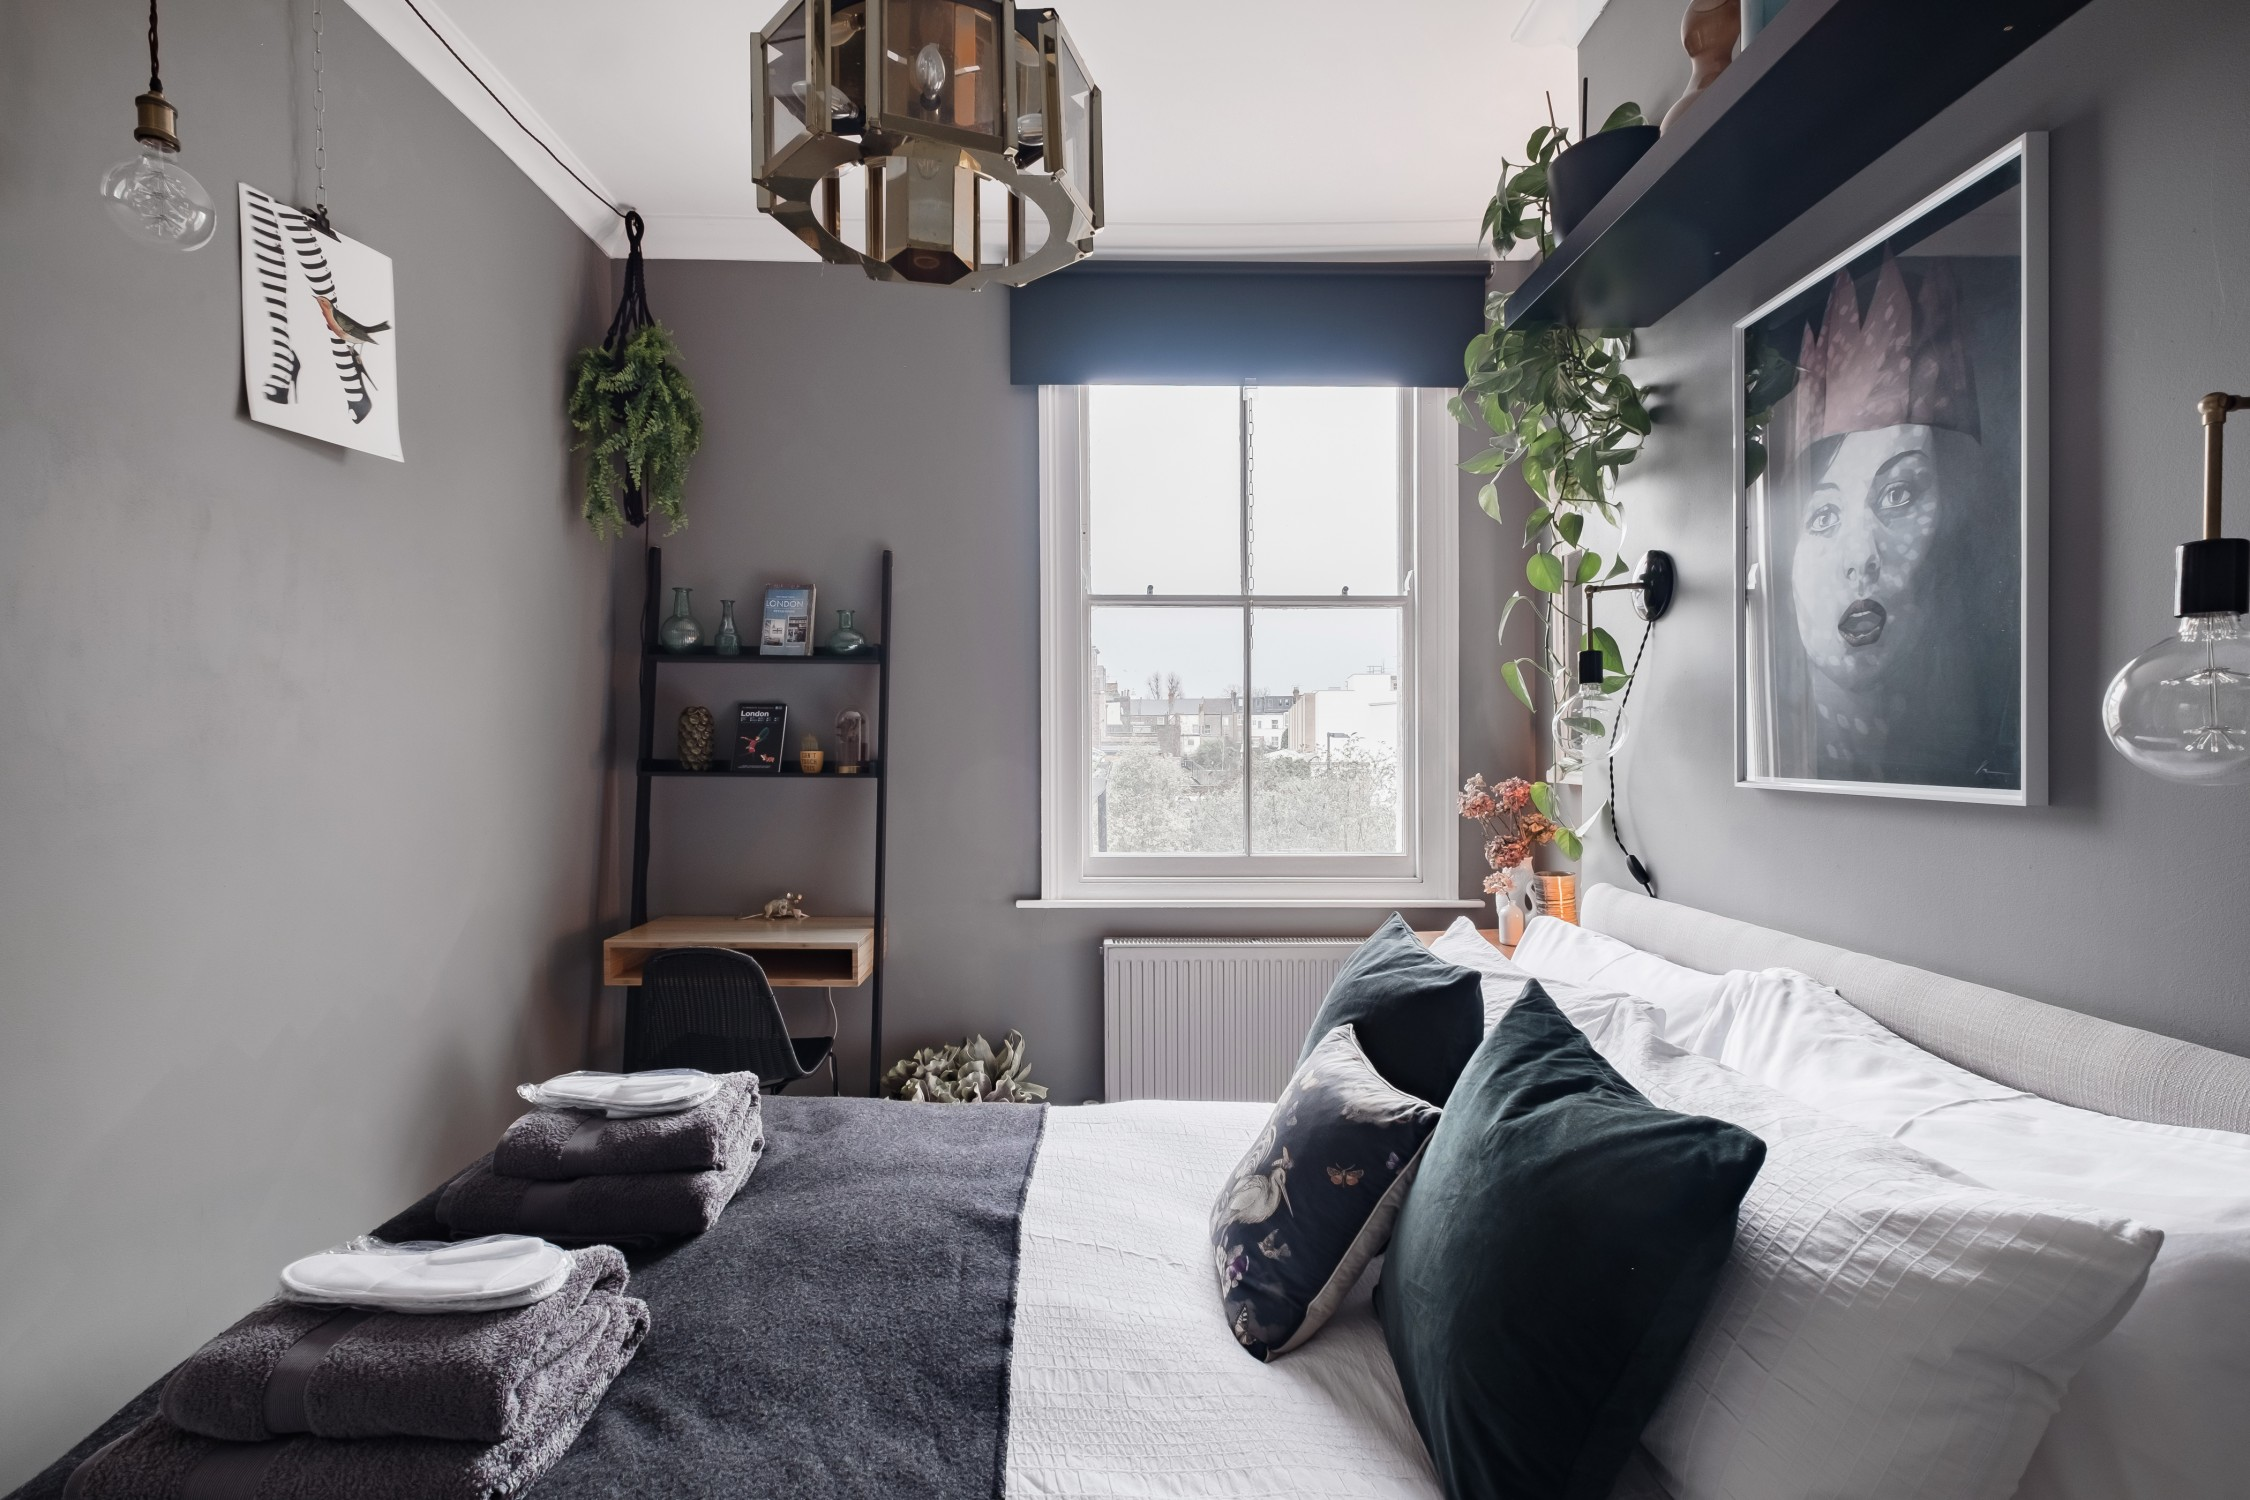 The Nordroom - Grey Tones in A Cozy London Home